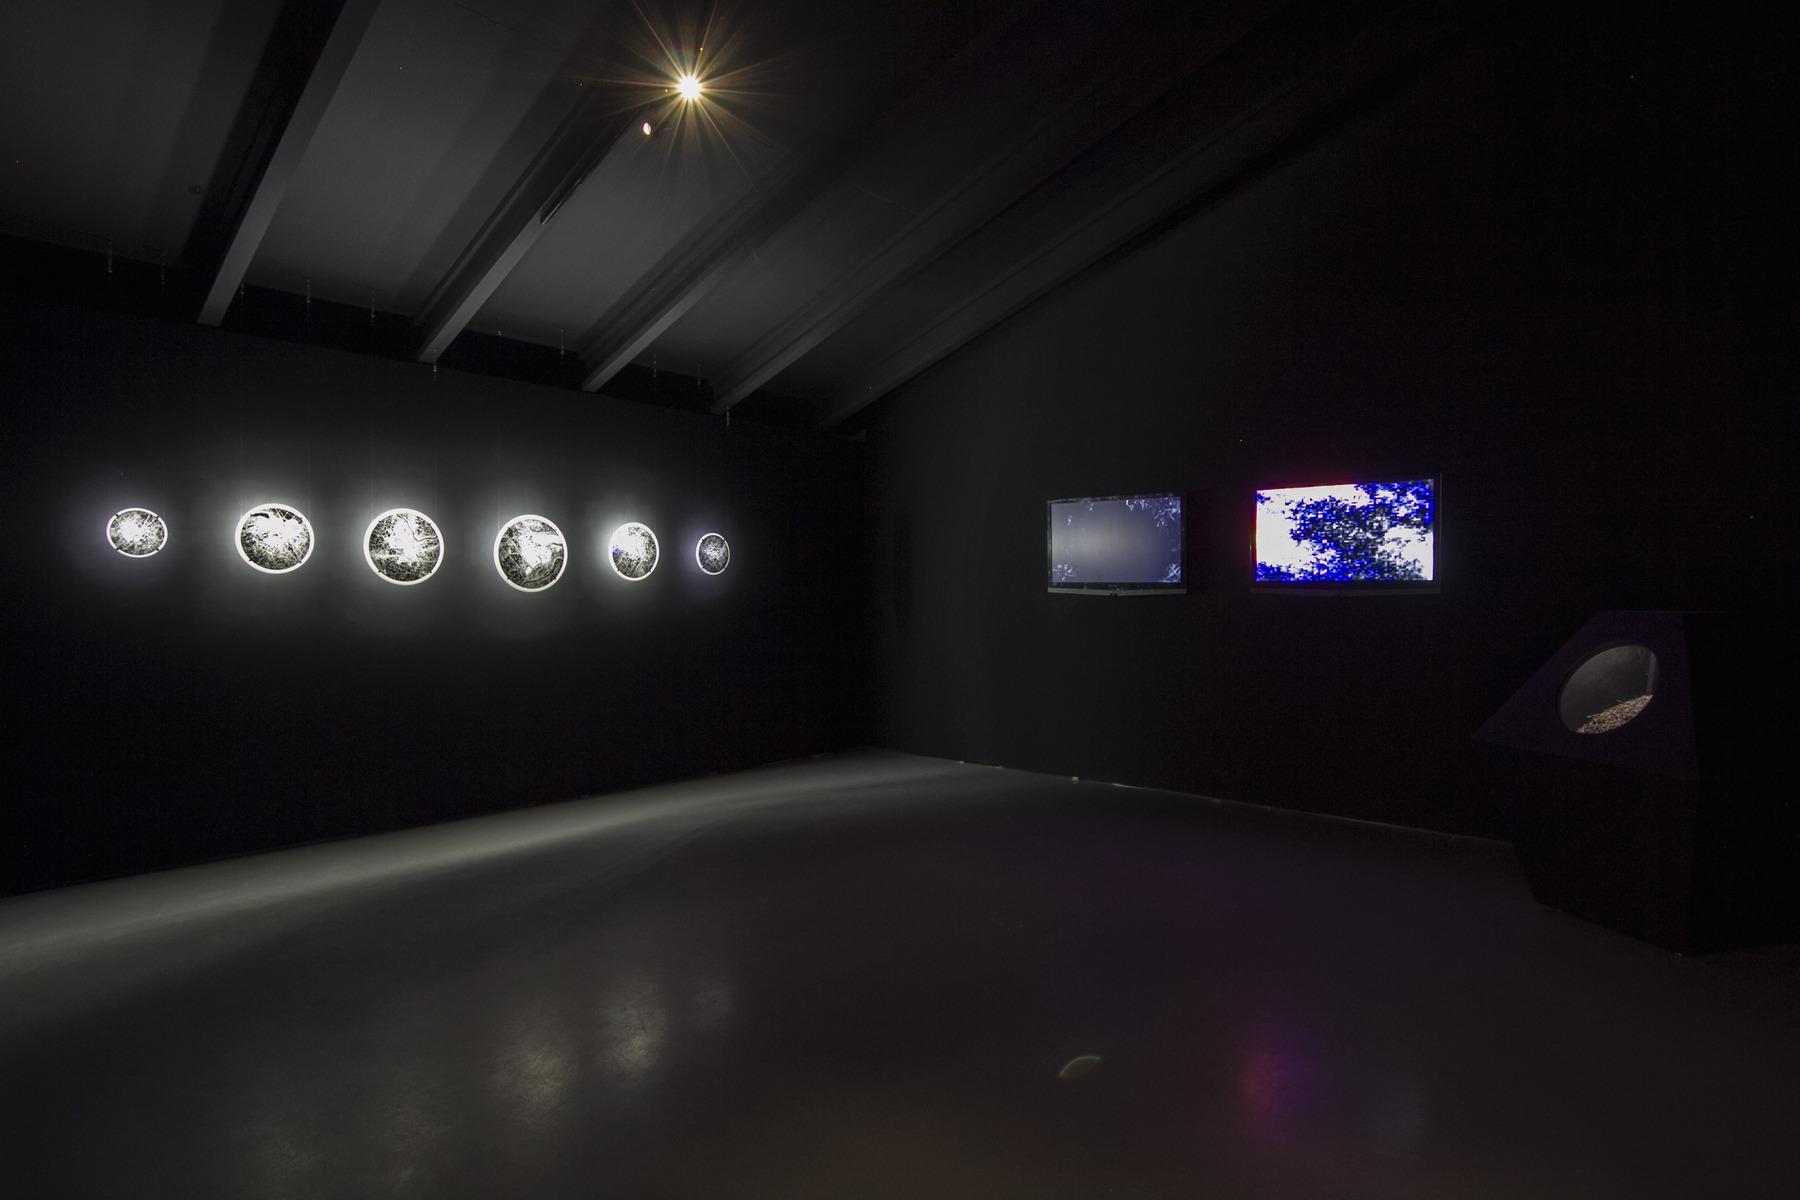 20-Citynature-Vilnius and Beyond-National-Gallery-Of-Art-Vilnius-2017-Kuai -Shen